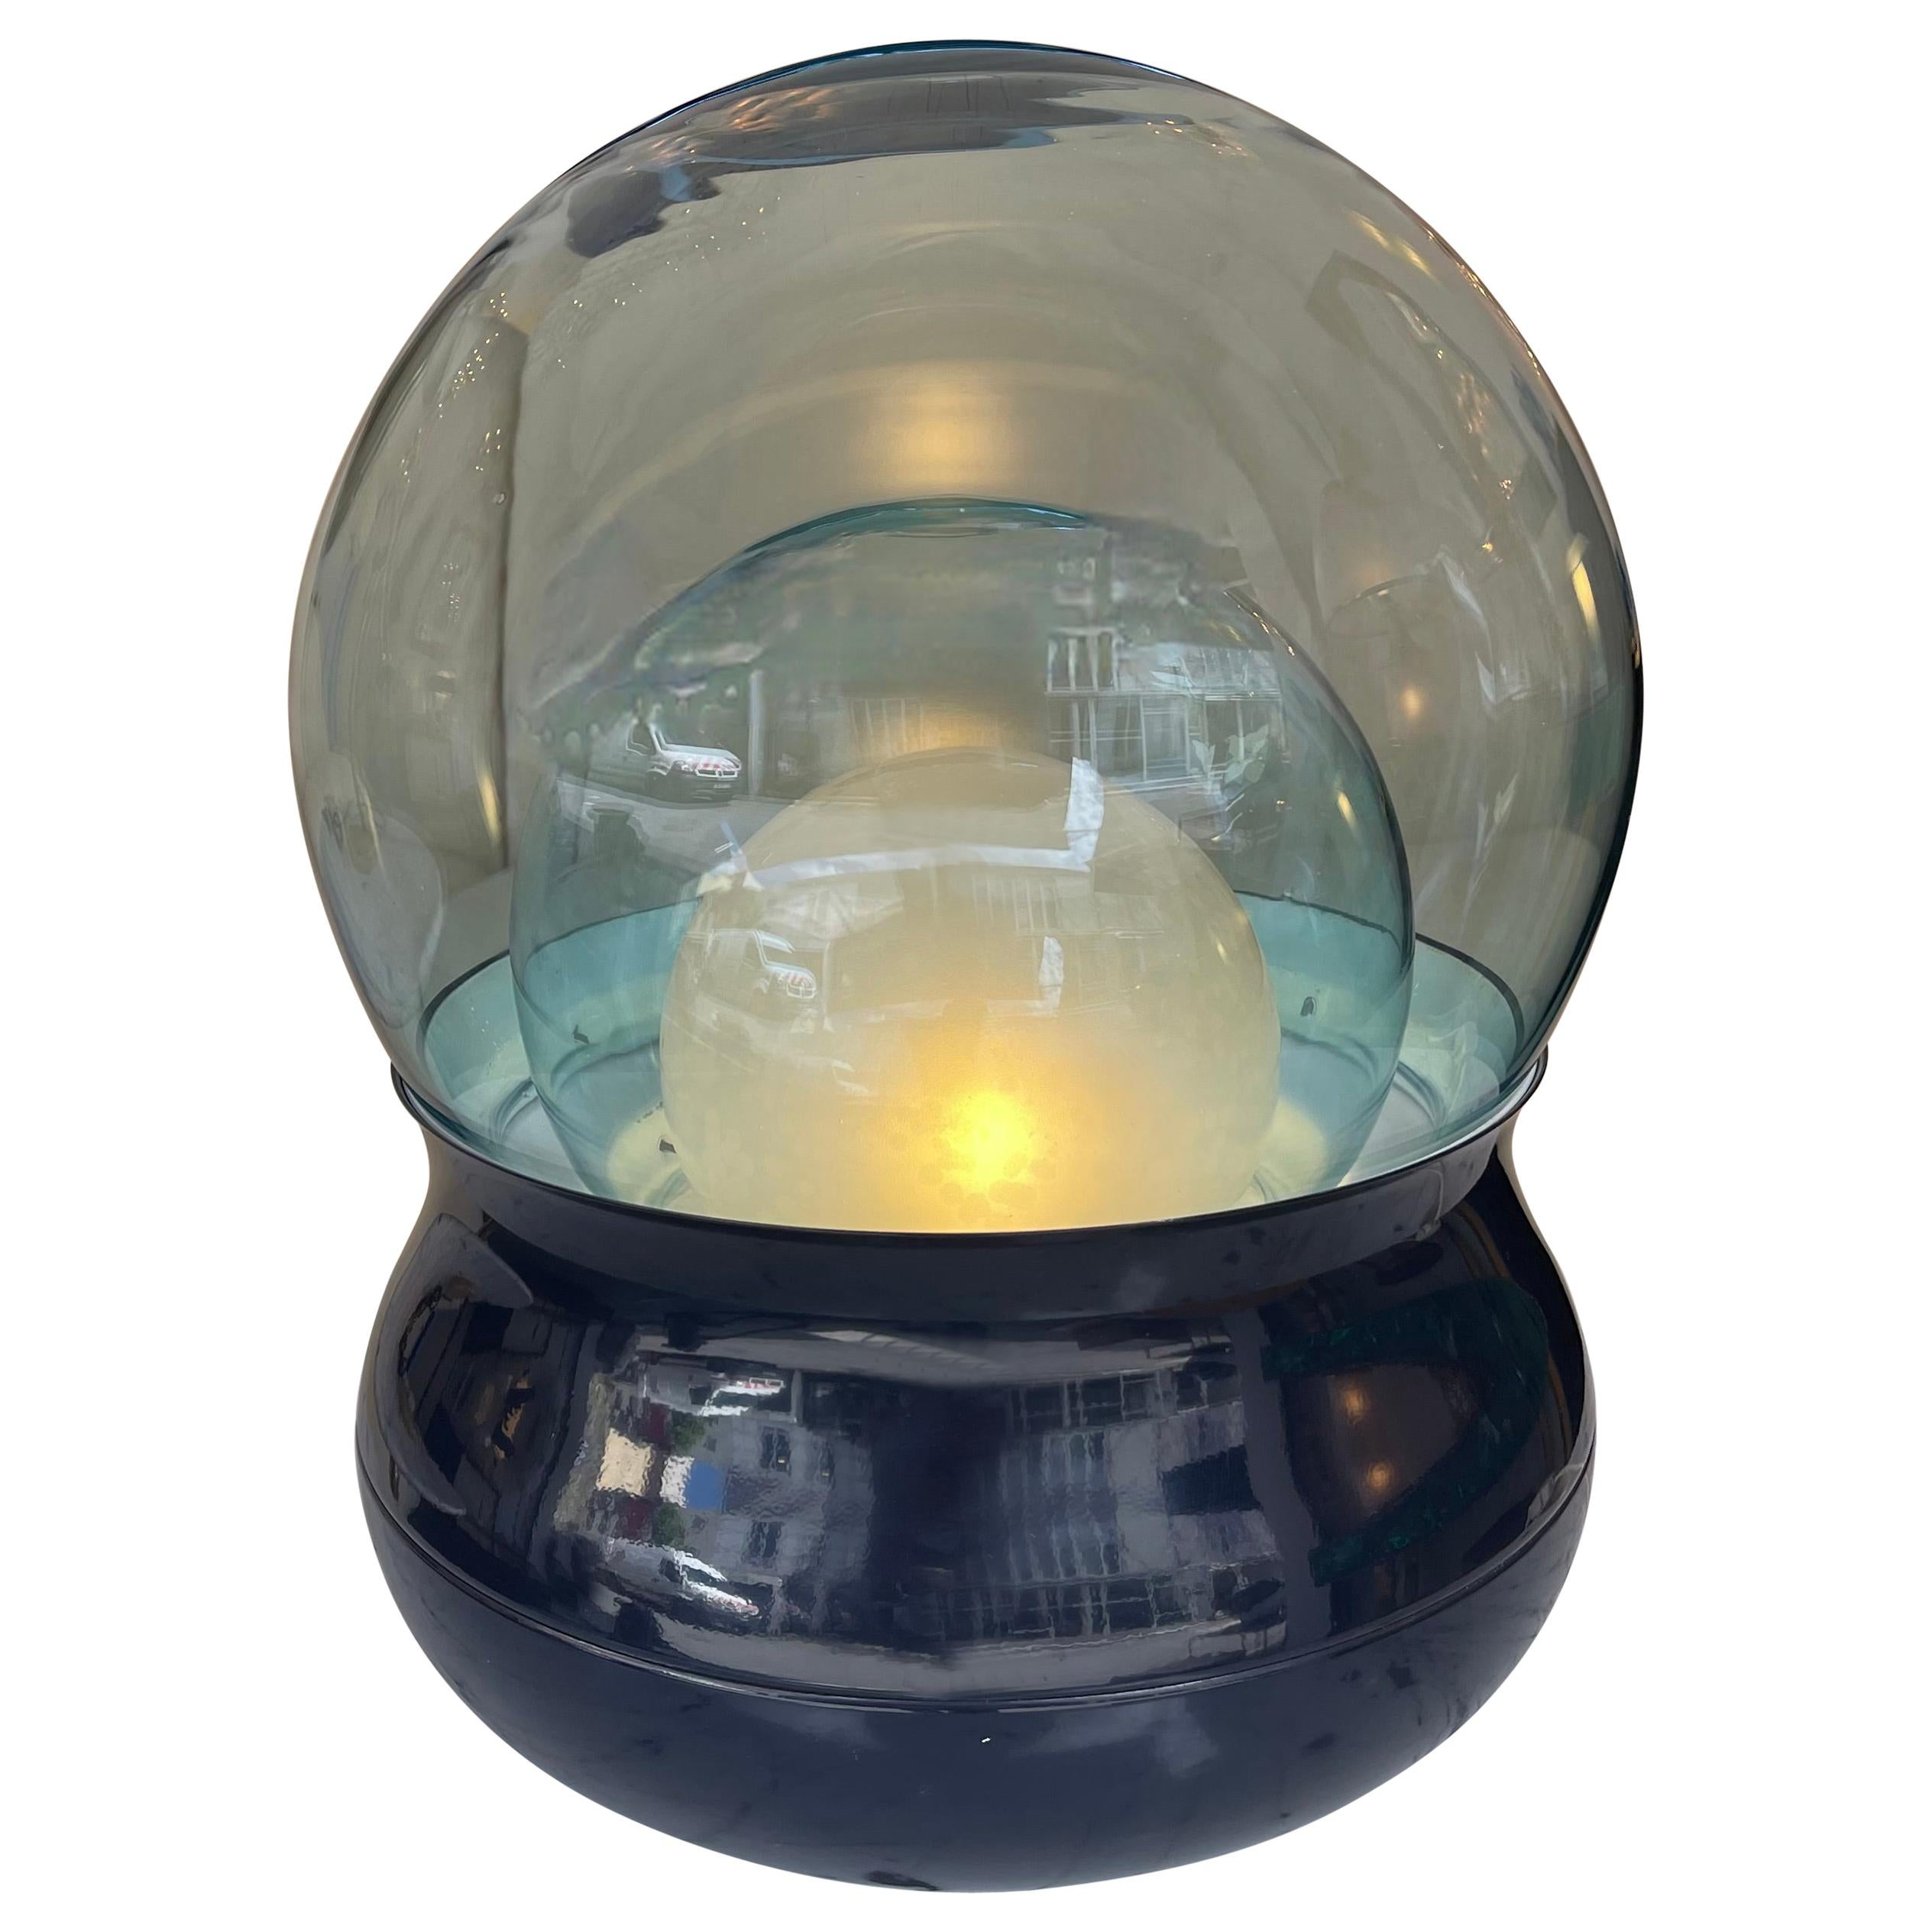 Lamp TL278 Murano Glass Metal by Giorgio Longoni for Stilnovo, Italy, 1970s